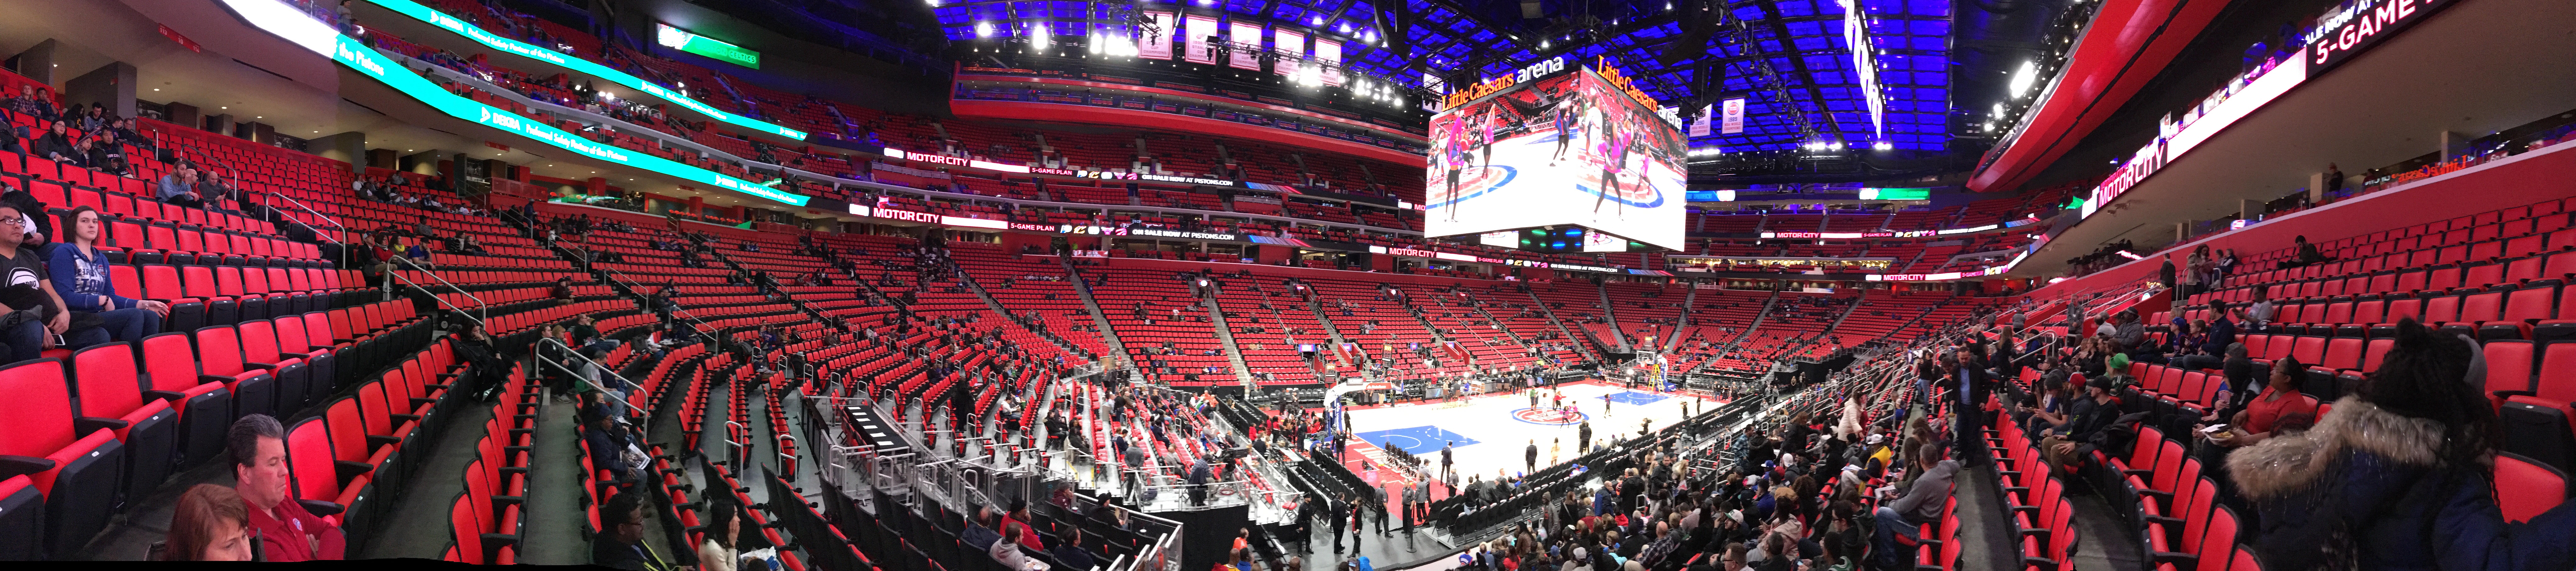 Detroit Pistons Little Caesar's Arena Detroit